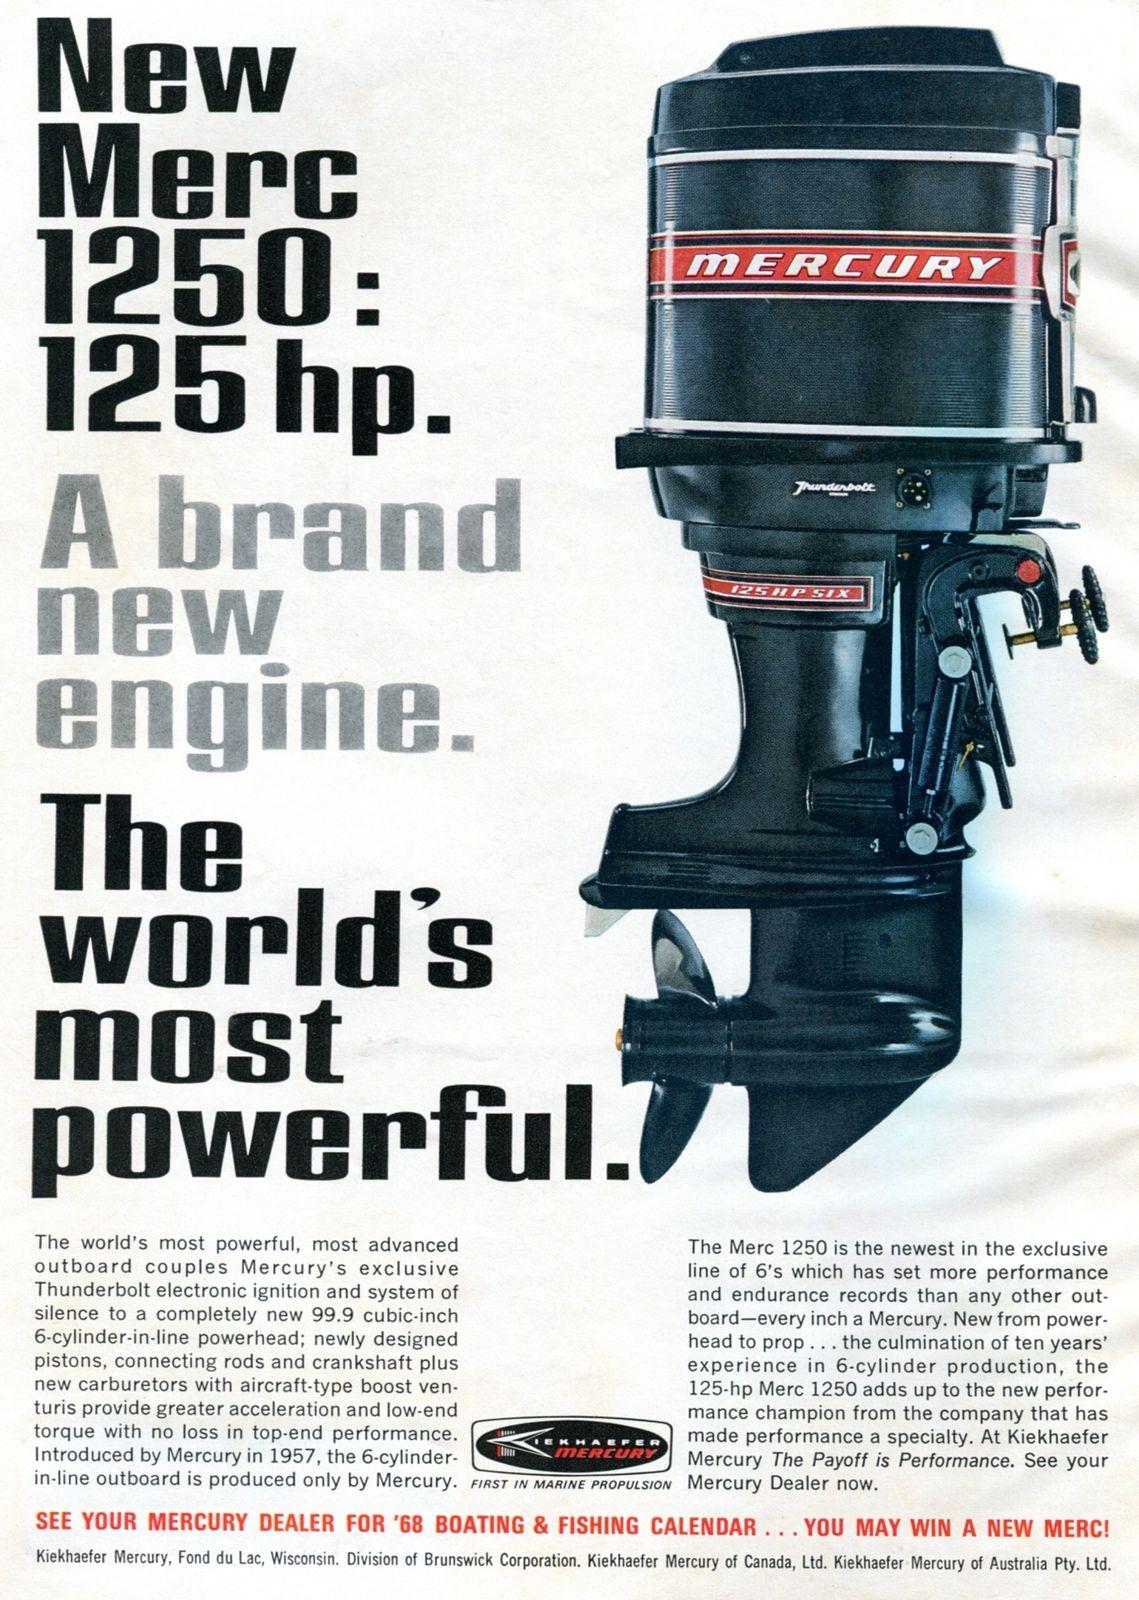 1968 Mercury 1250 Outboard Motor Advertising Outdoor Life January 1968 Mercury Boats Outboard Motors Outboard